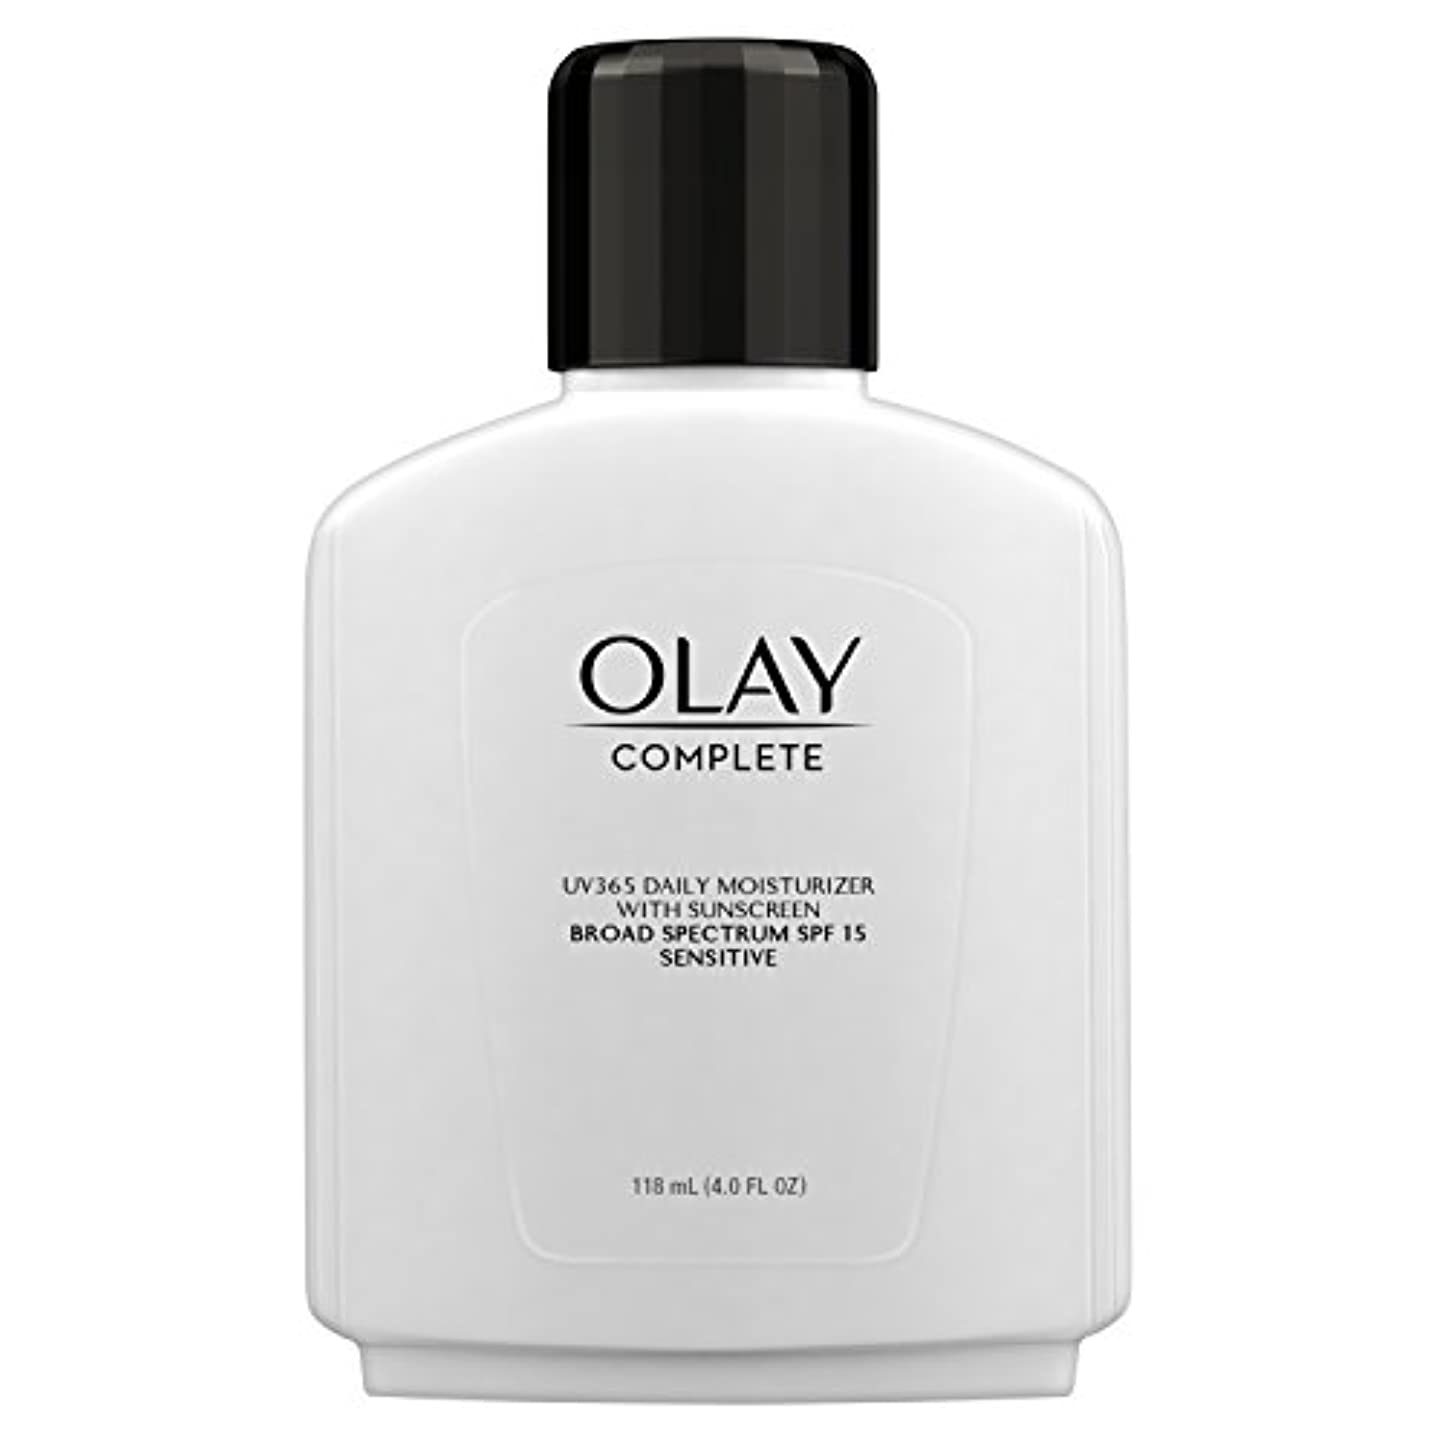 Olay Complete All Day Moisture Lotion UV Defense SPF 15, Sensitive Skin, 4 fl oz (118 ml) (1 pack) (並行輸入品)